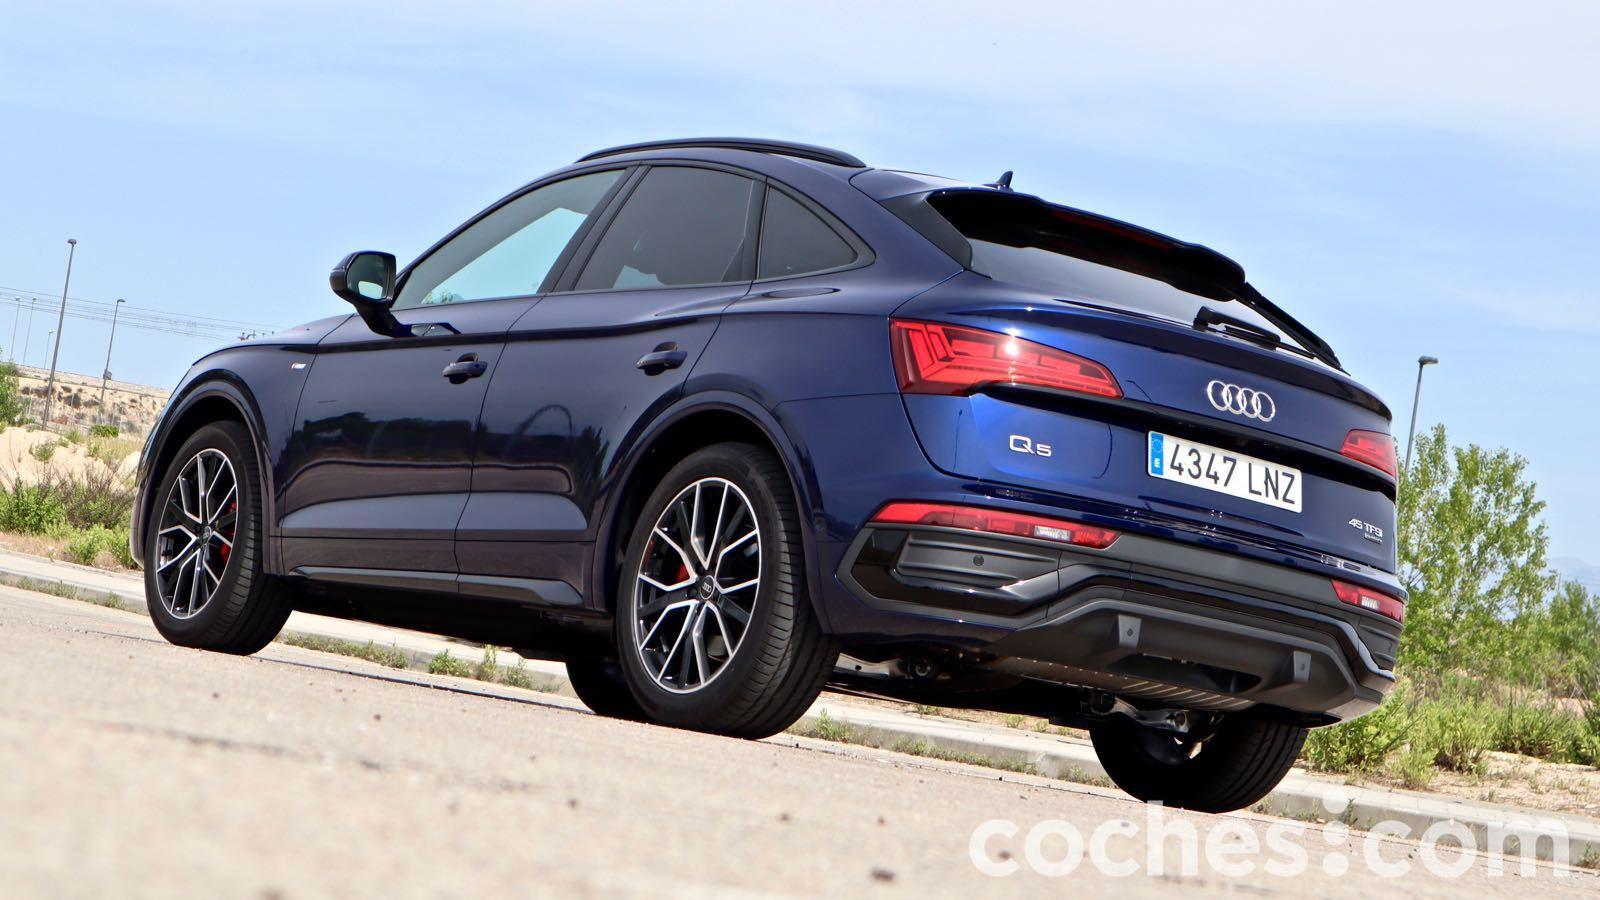 Audi Q5 Sportback 45 TFSI prueba – 6